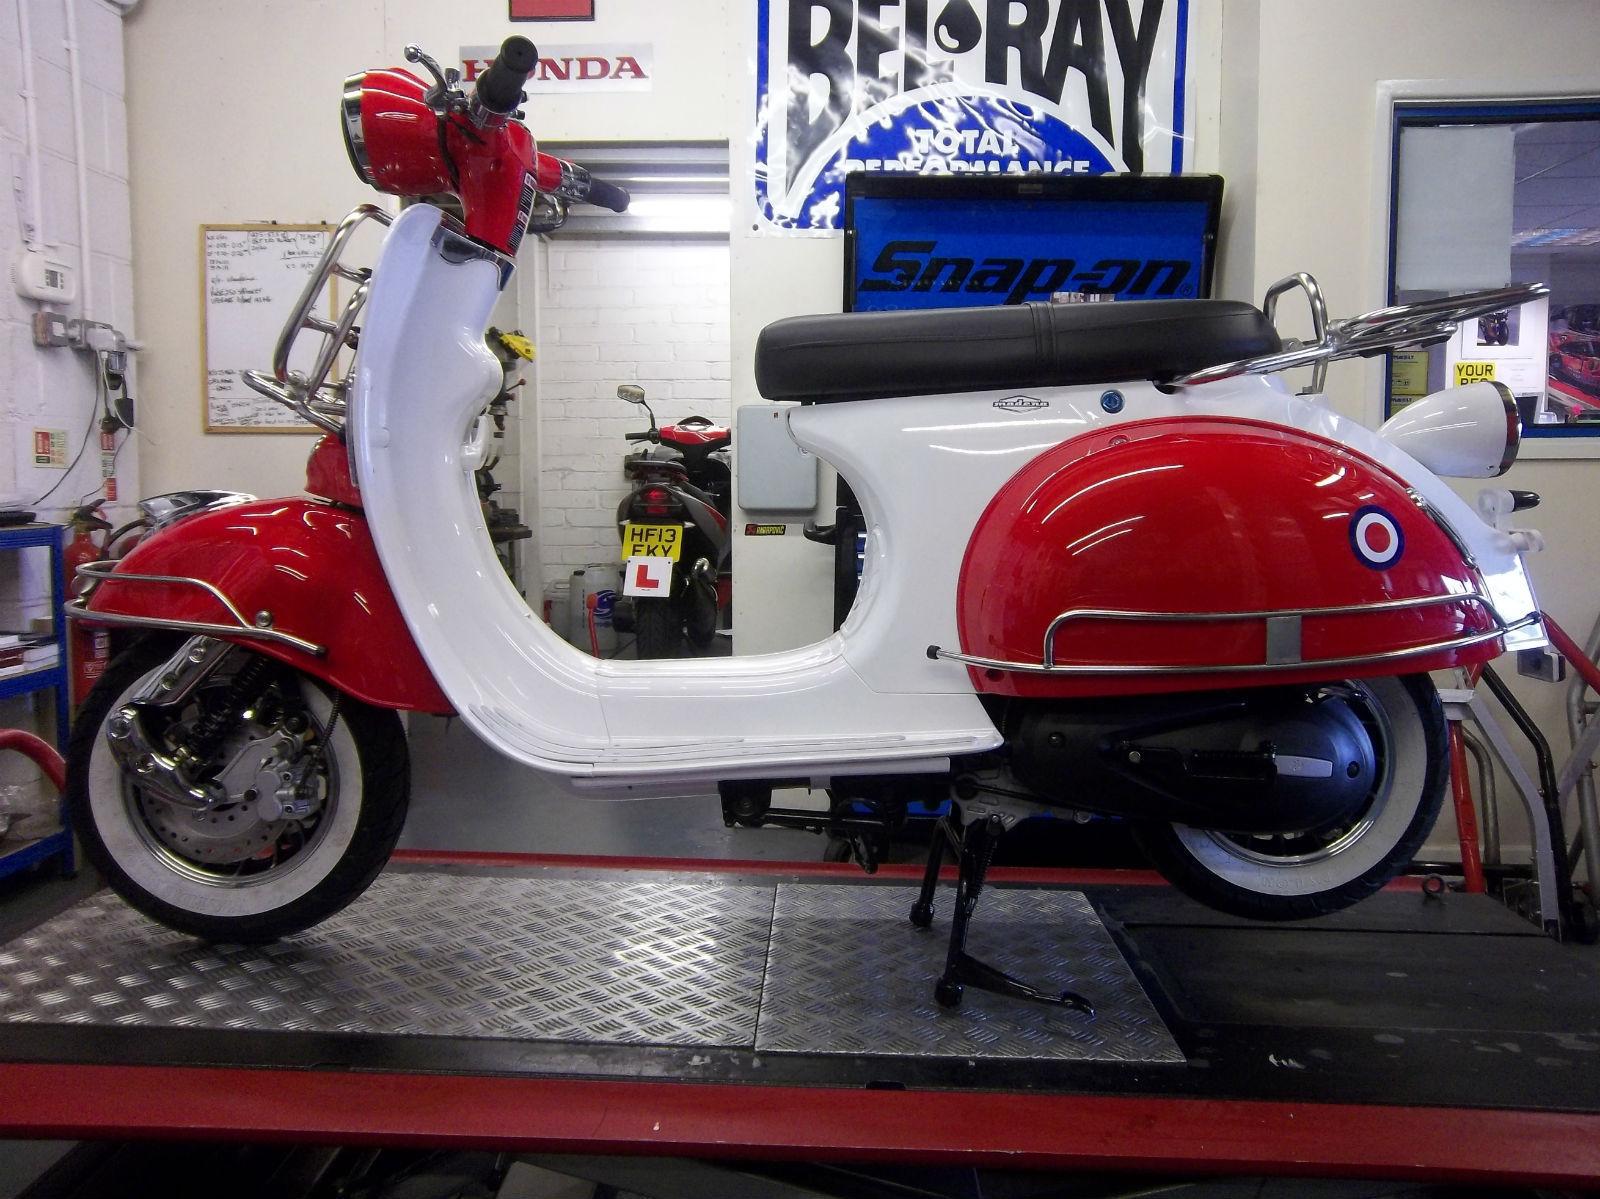 ajs modena 50 cc scooter 1950 39 s vespa shape mod moped. Black Bedroom Furniture Sets. Home Design Ideas